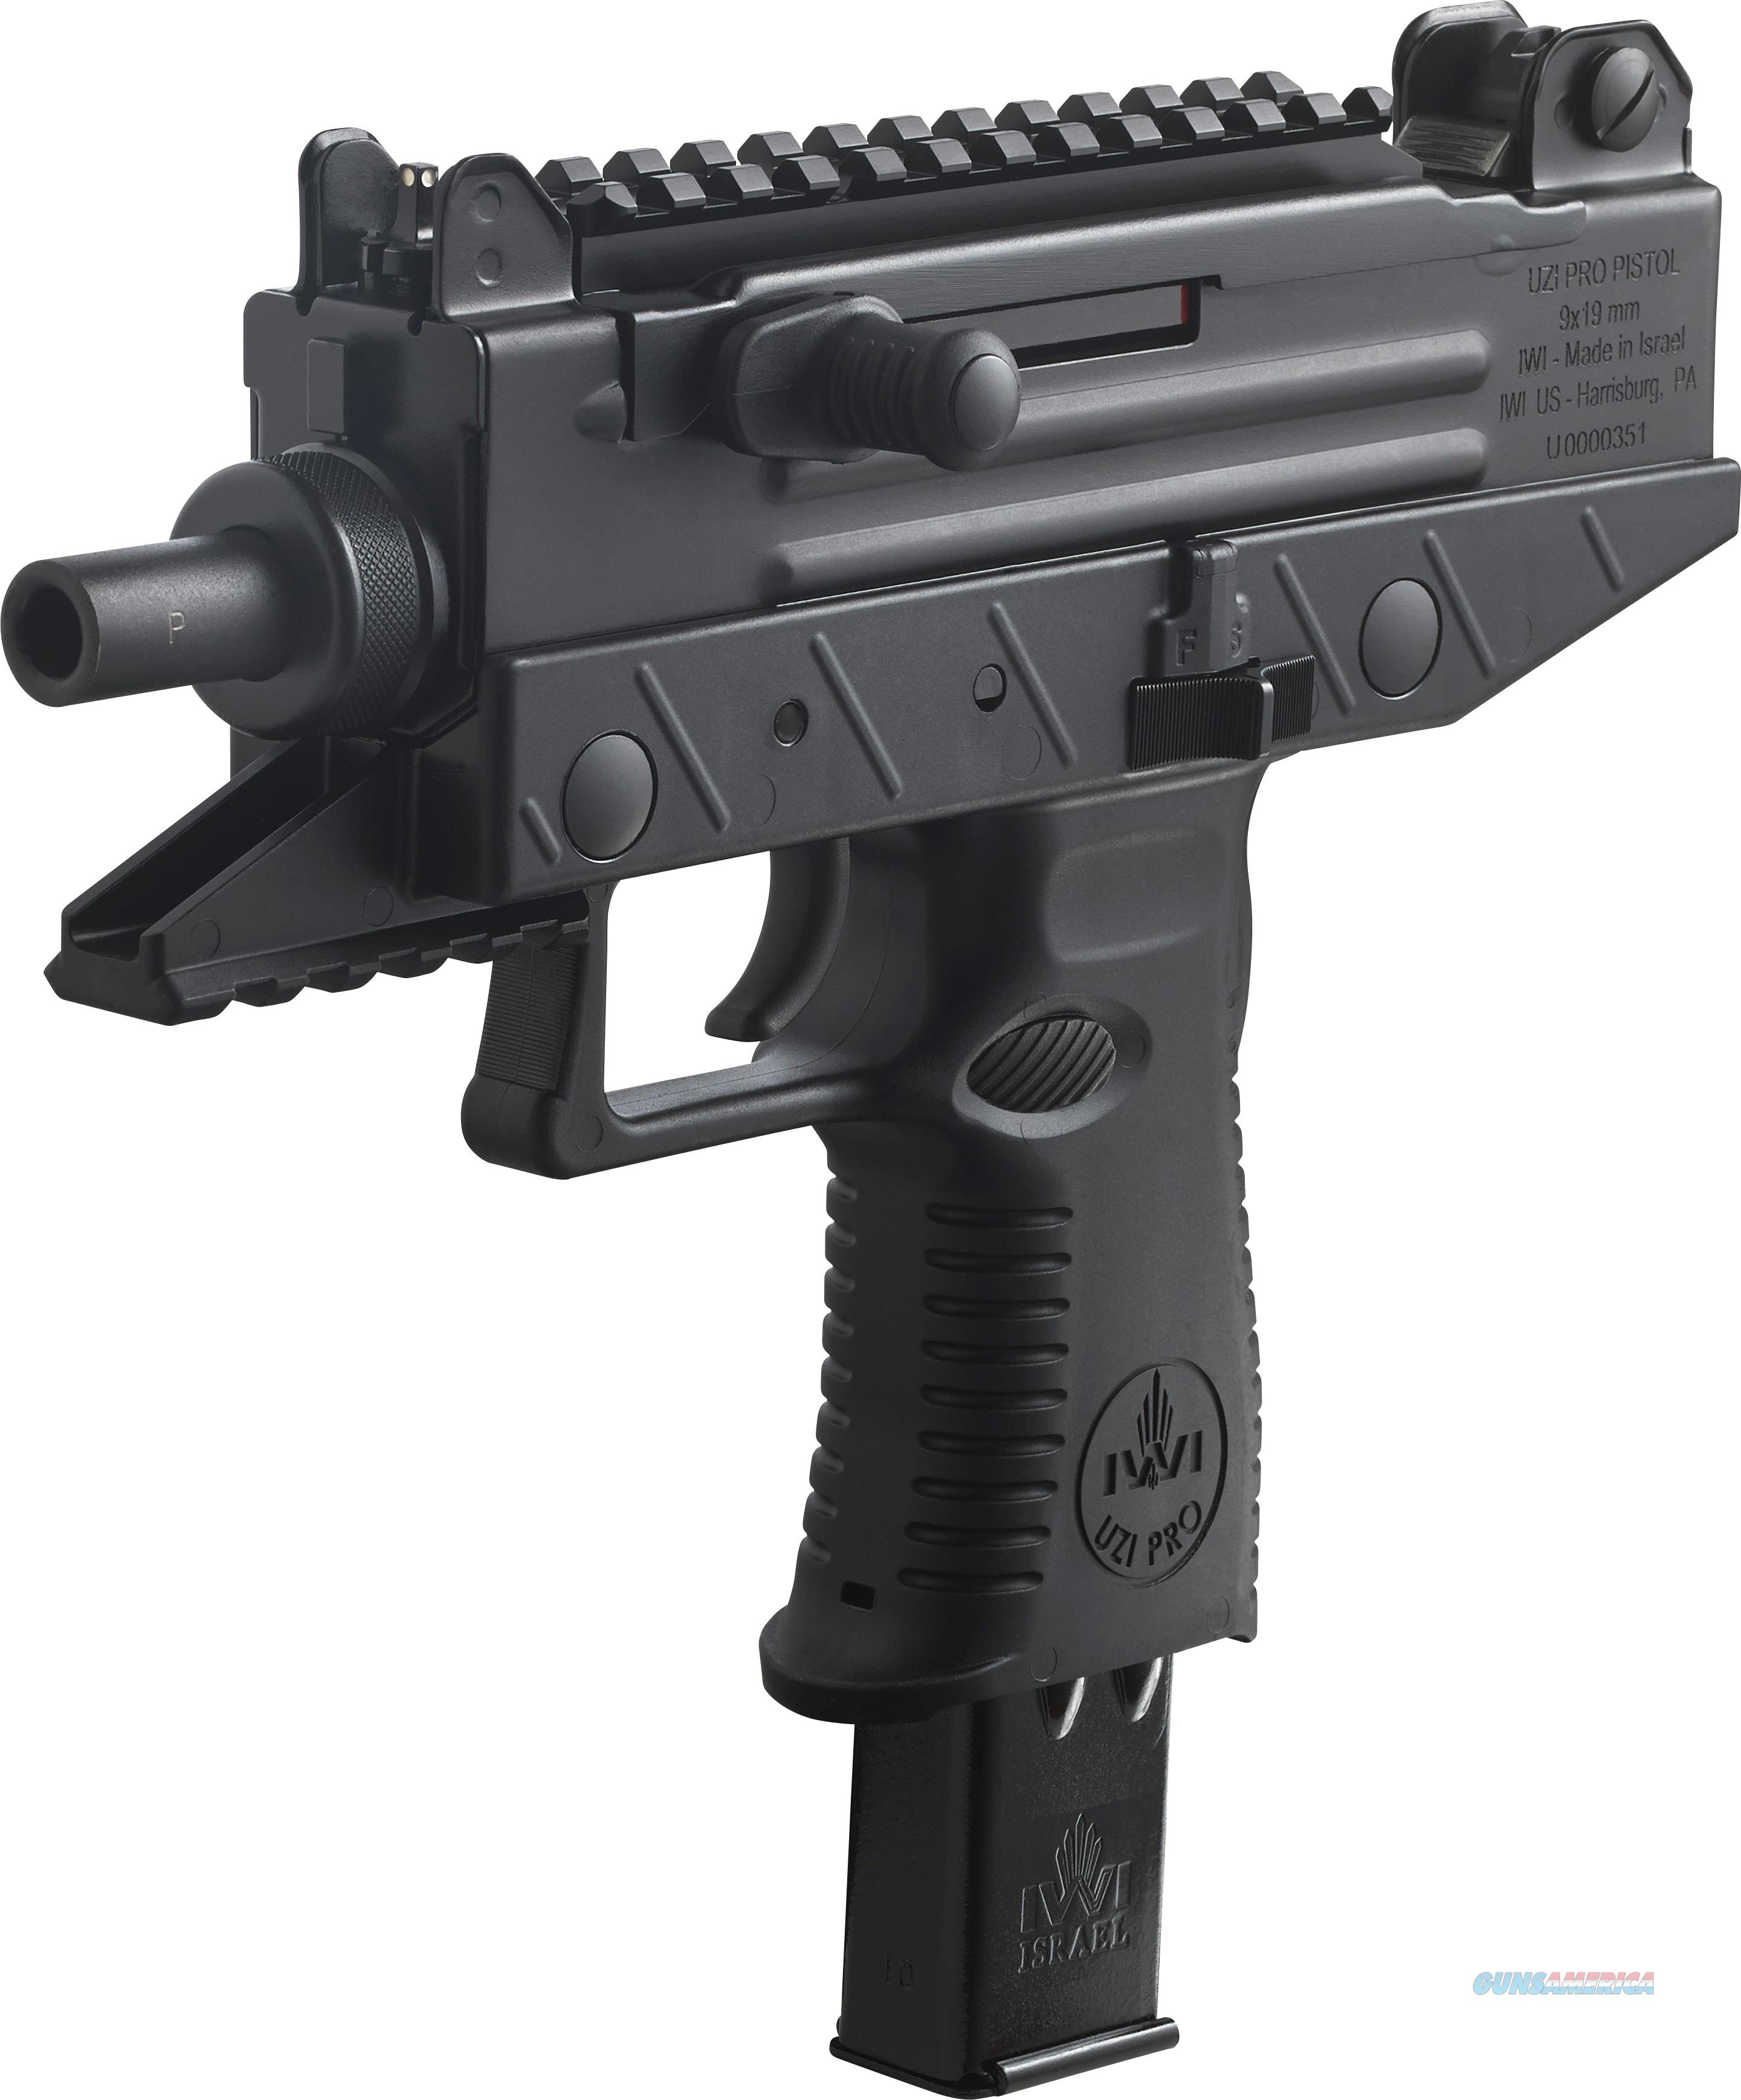 "IWI UZI Pro Pistol 9mm Luger 4.5"" 25 Rounds UPP9S  Guns > Pistols > IWI Pistols"